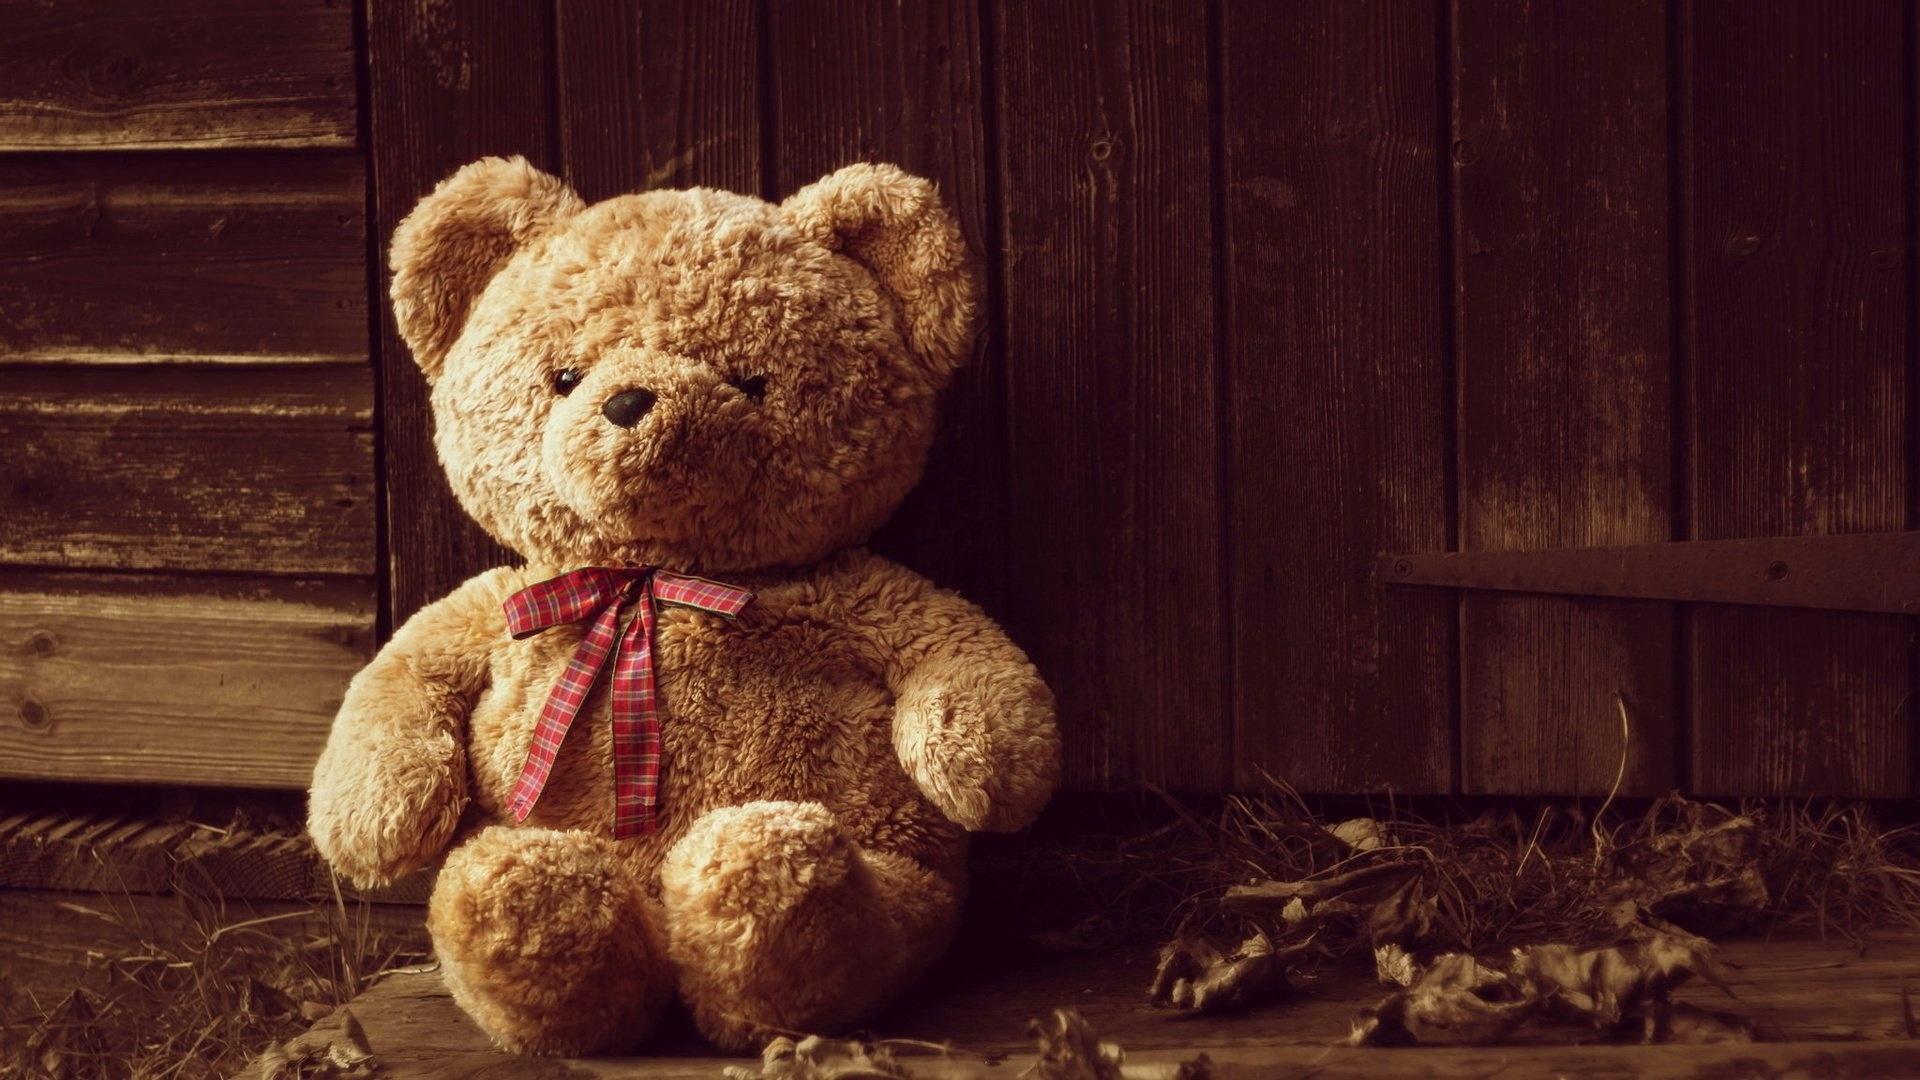 Teddy Bear Wallpaper